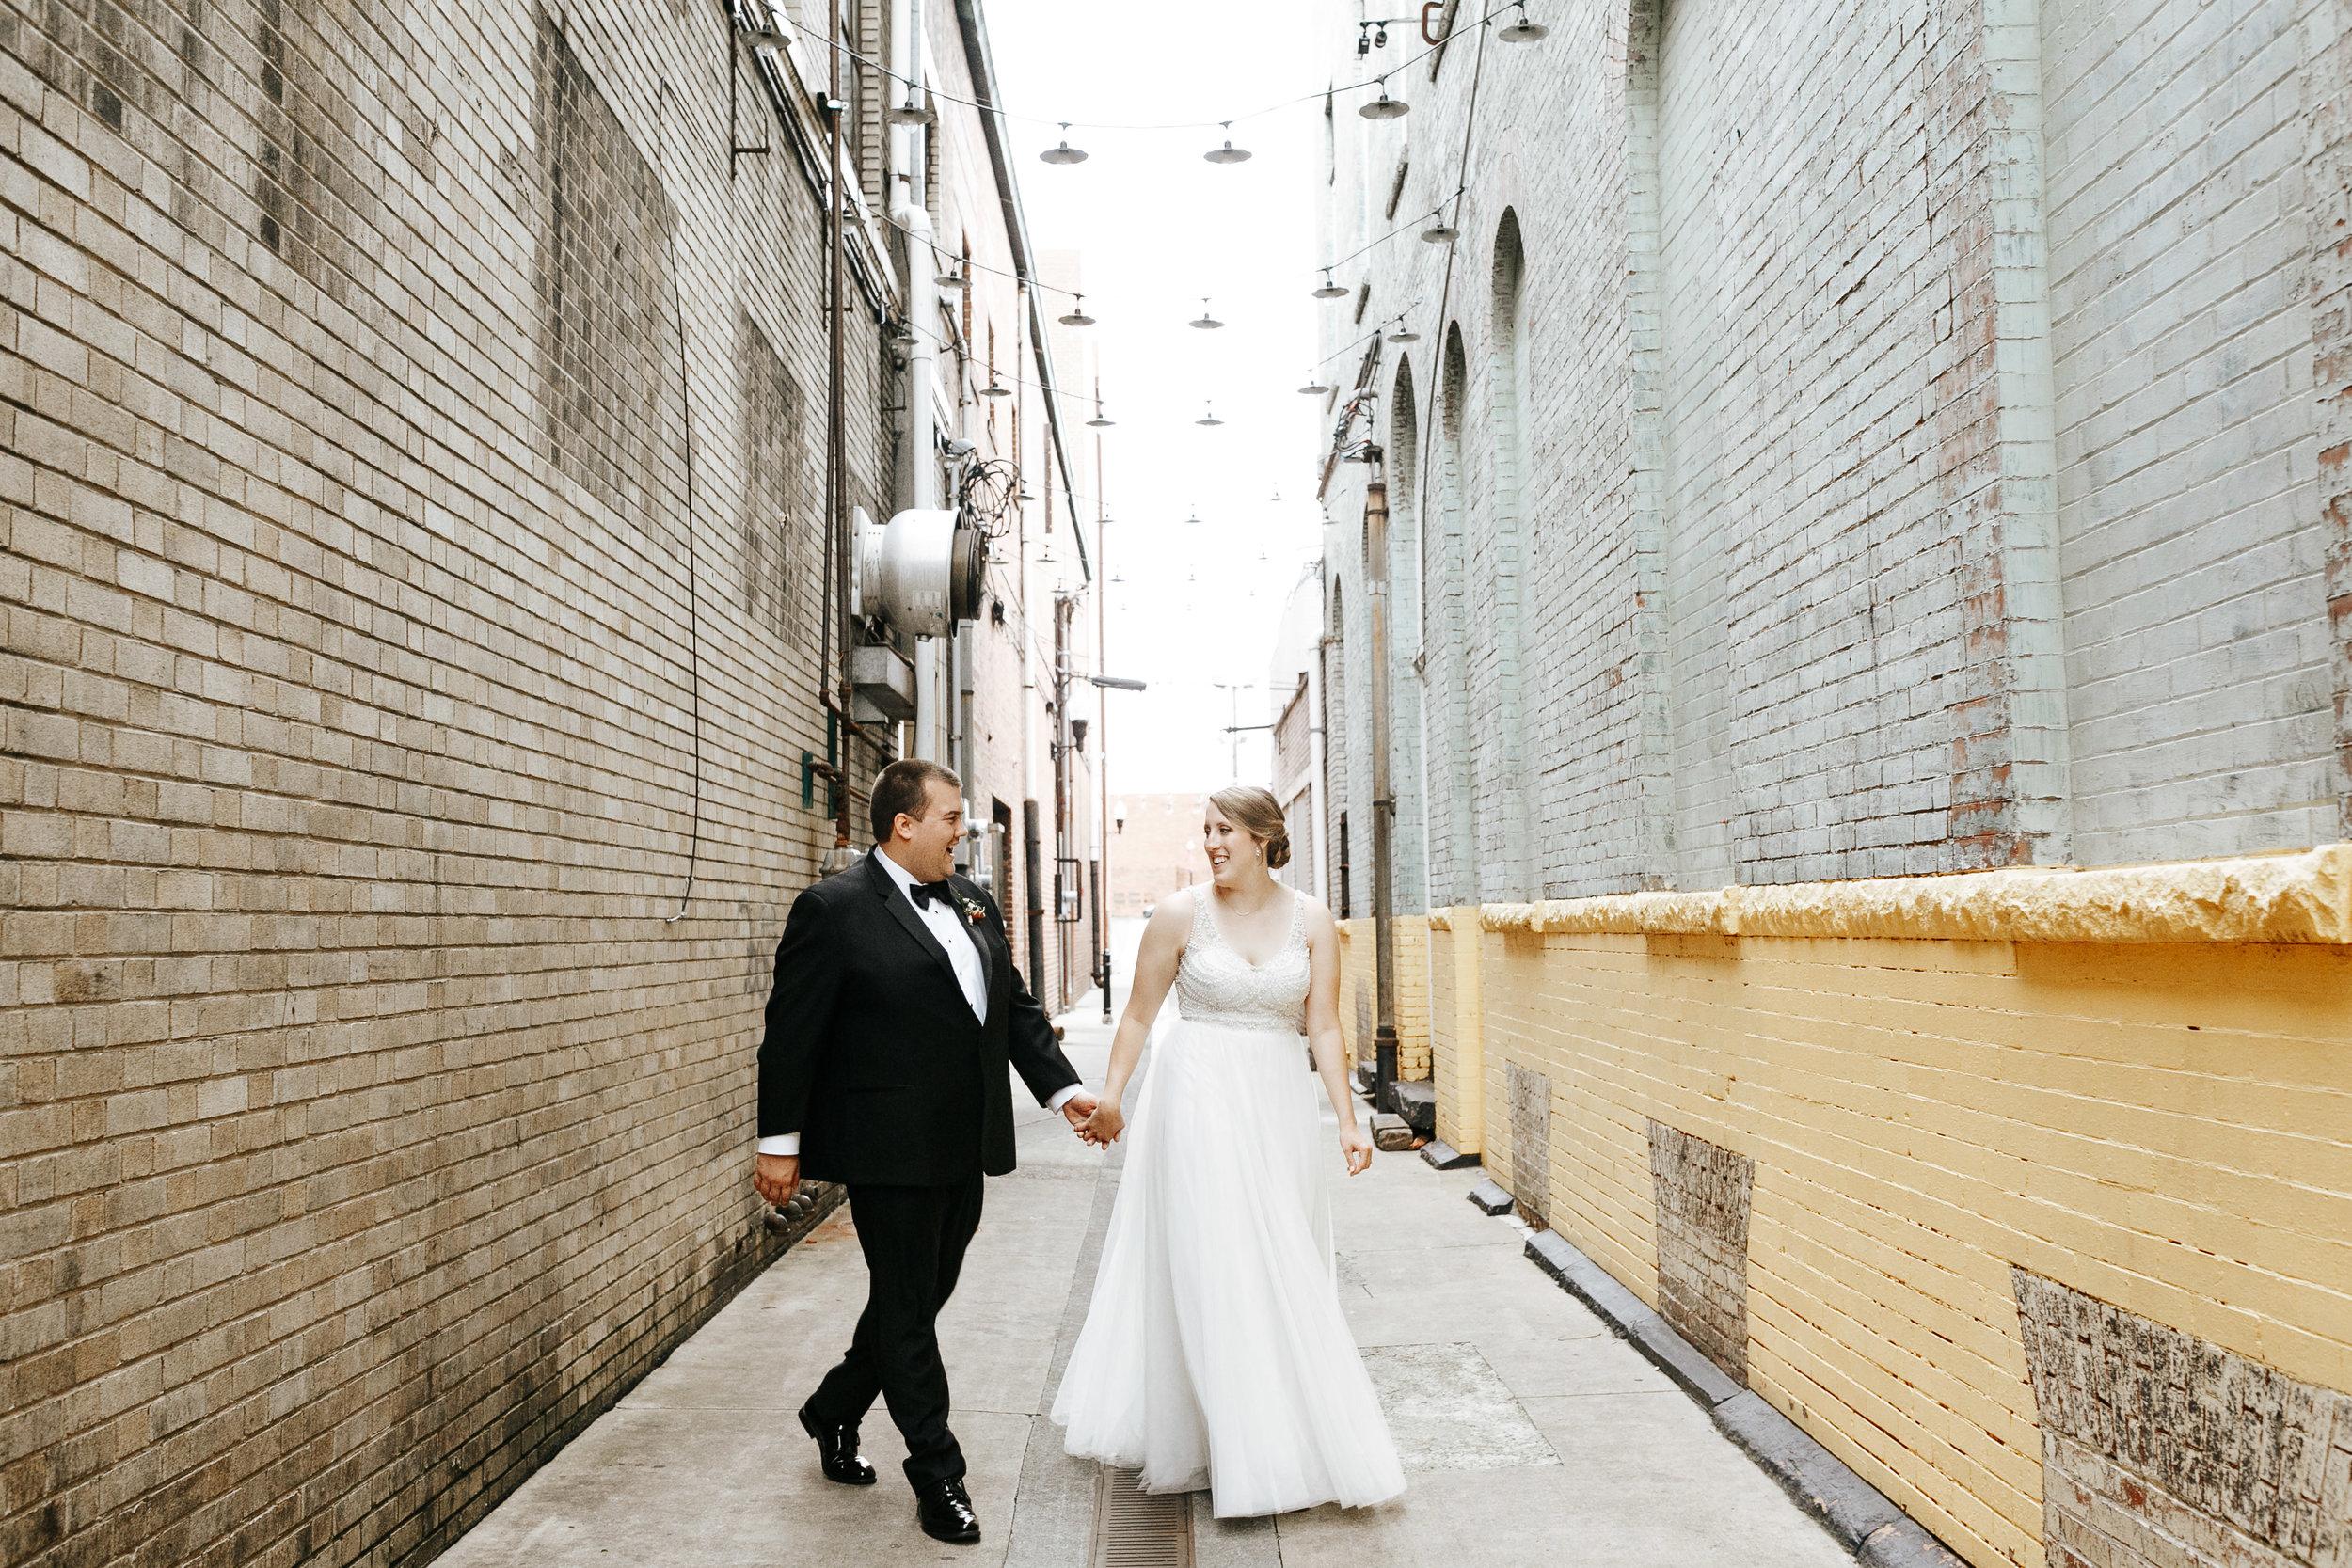 bohemian-photographer-wedding-tennessee-49.jpg